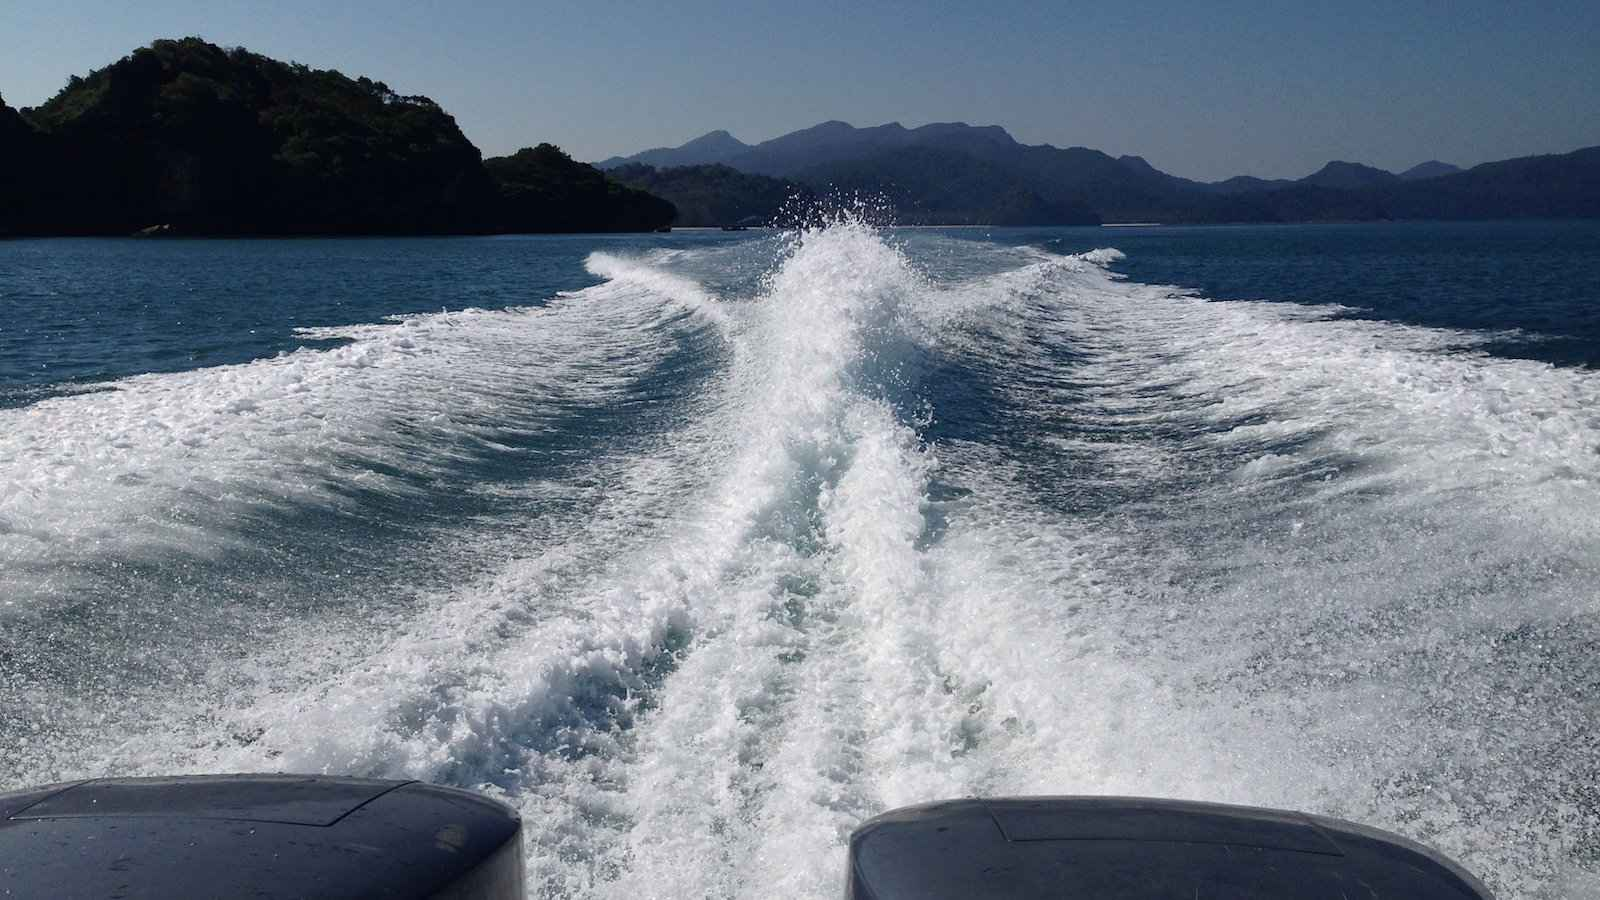 You can reach Thailand's island of Koh Tarutao on a fun speedboat!